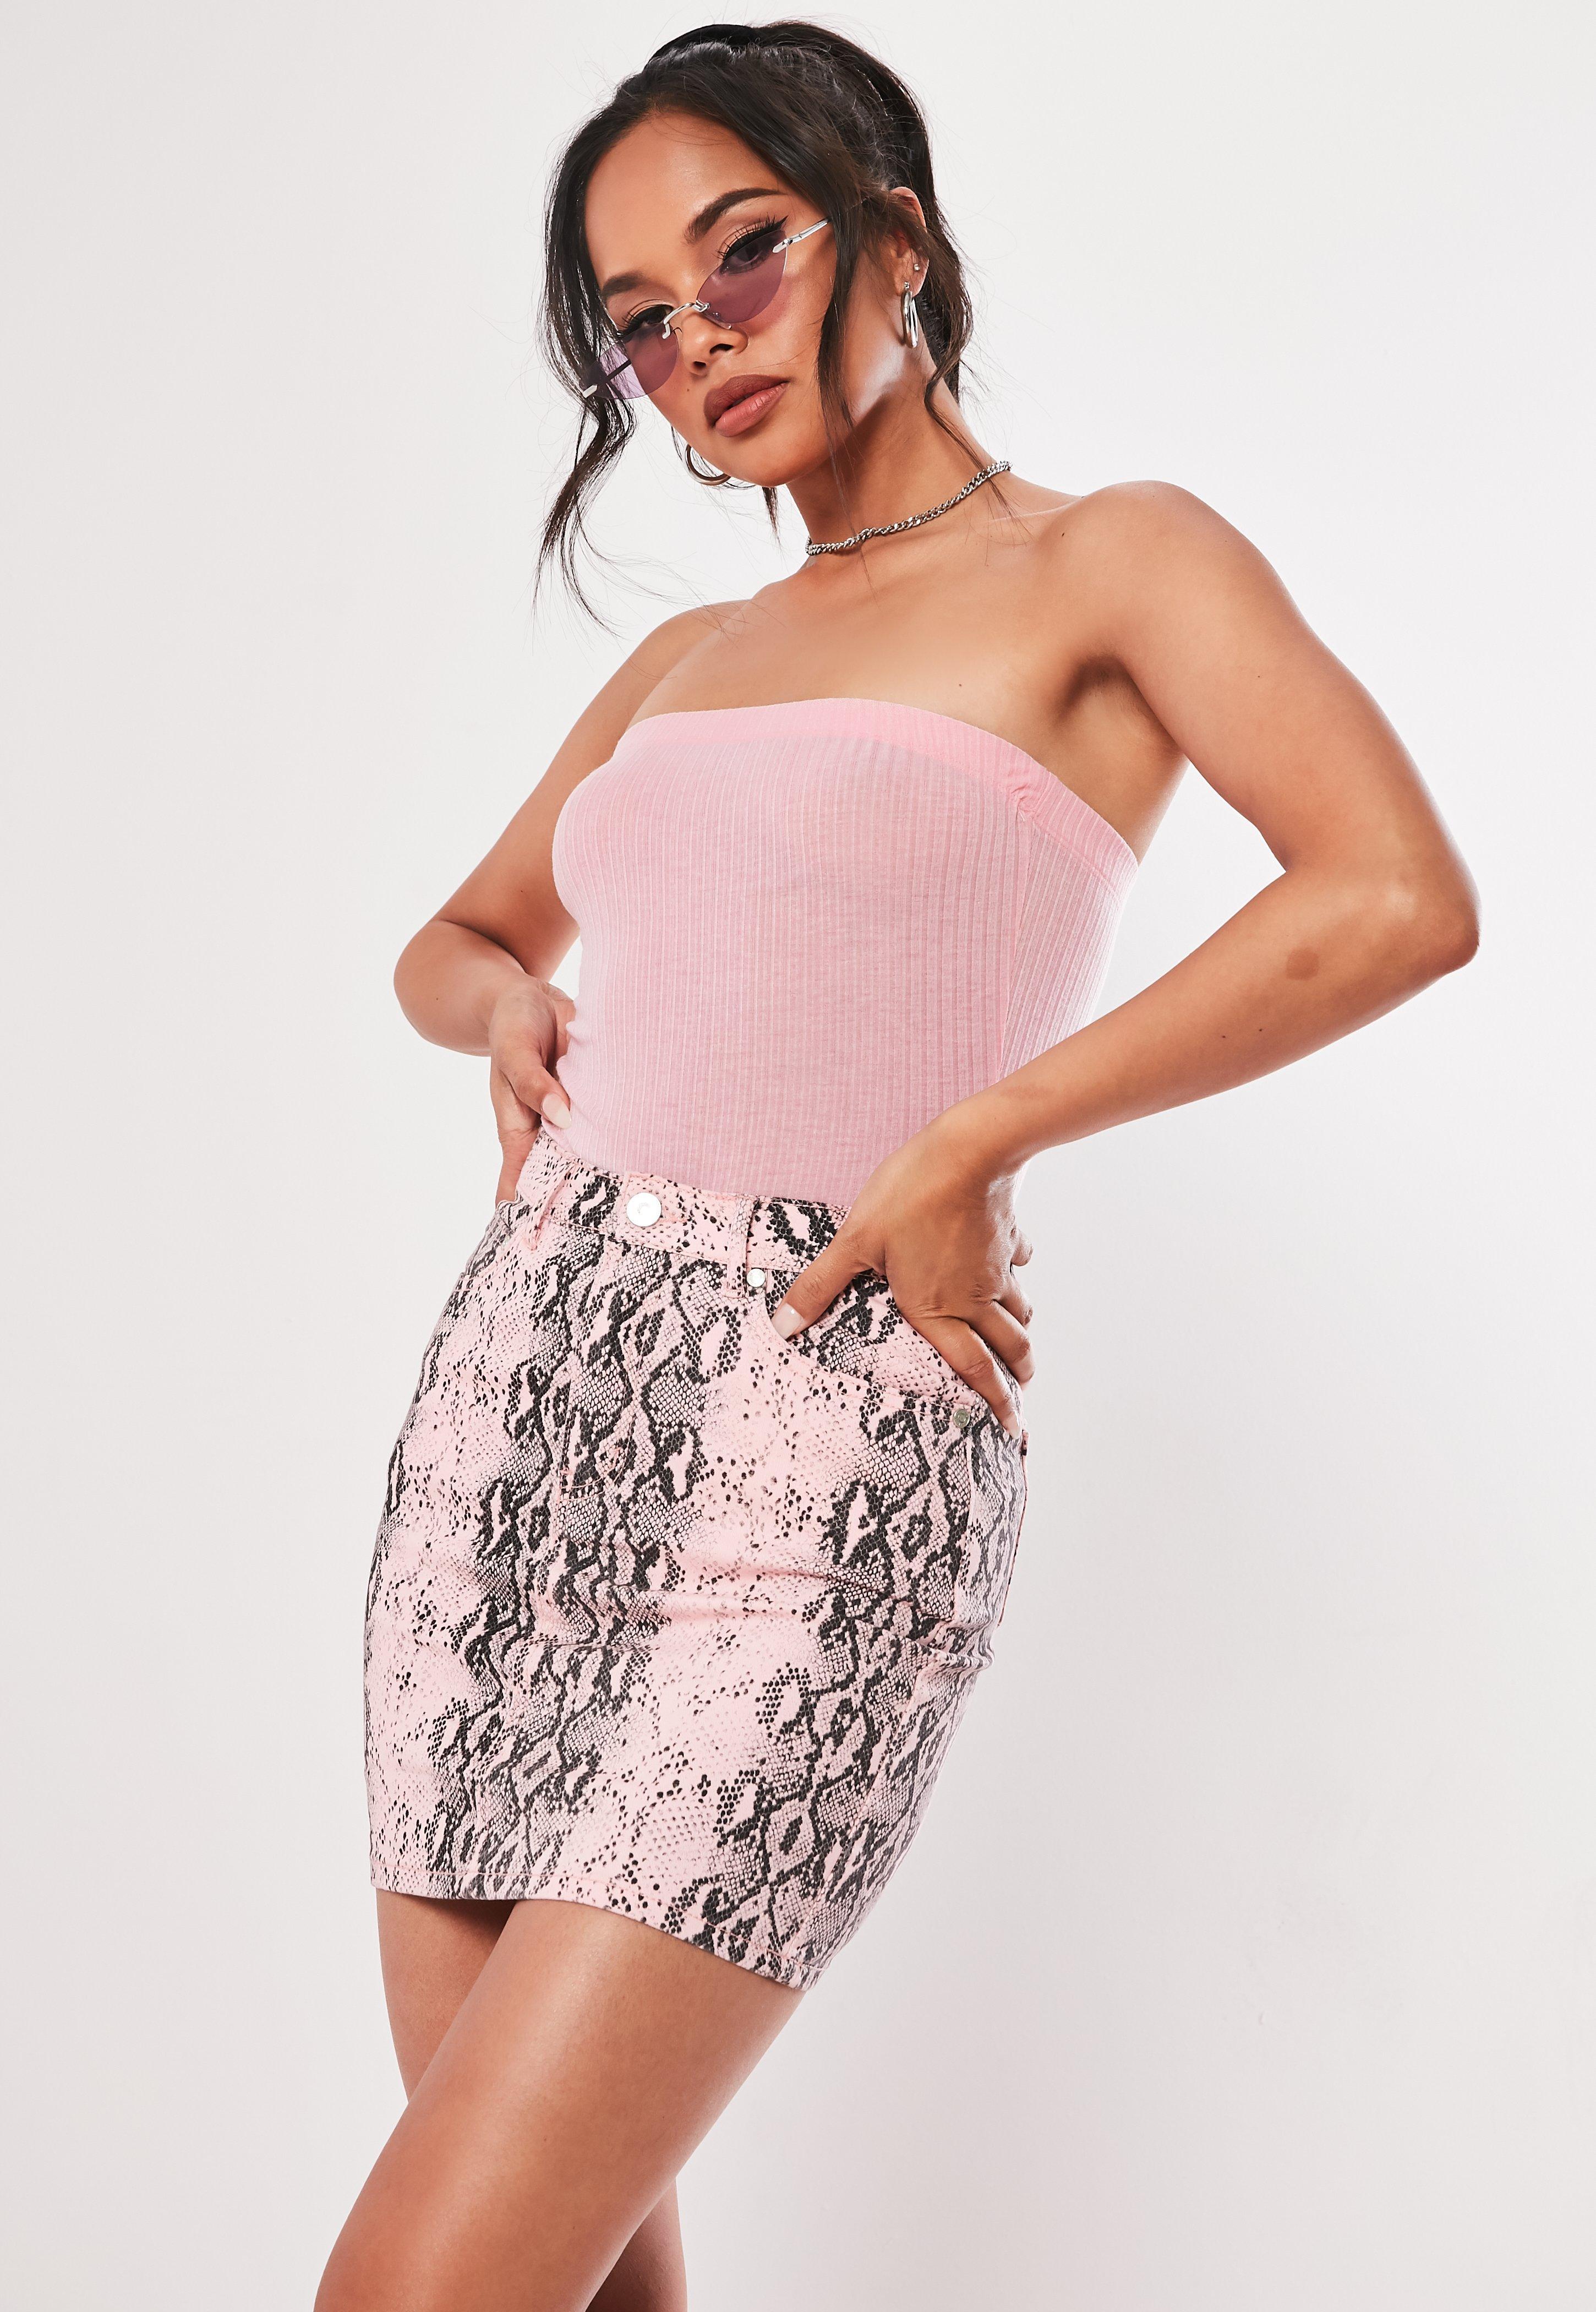 cbd74e73c Hot Pink Scoop Neck Sleeveless Shiny Spandex Aerobic Yoga Active Wear Dance  Unitard Bodysuit .